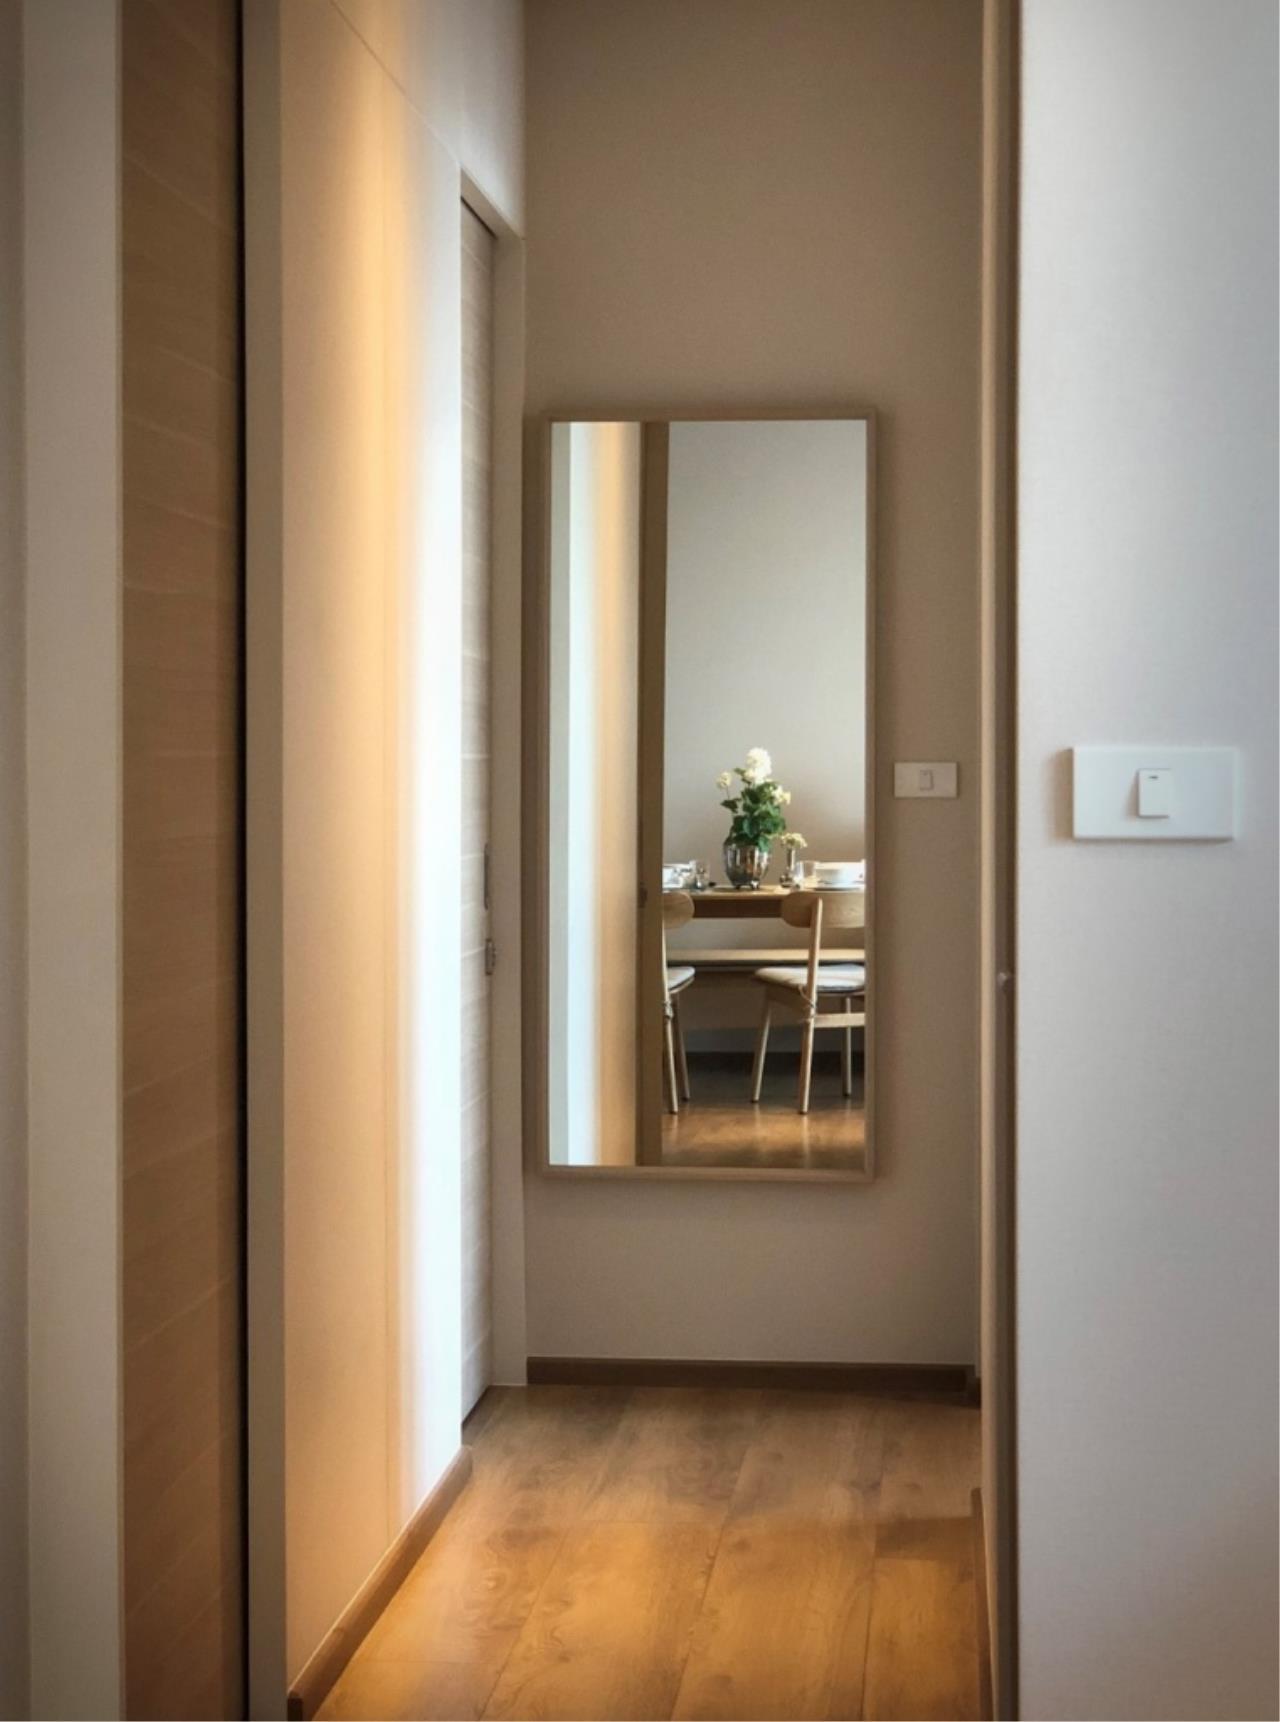 Century21 Skylux Agency's Park 24 / Condo For Rent / 2 Bedroom / 53.53 SQM / BTS Phrom Phong / Bangkok 7